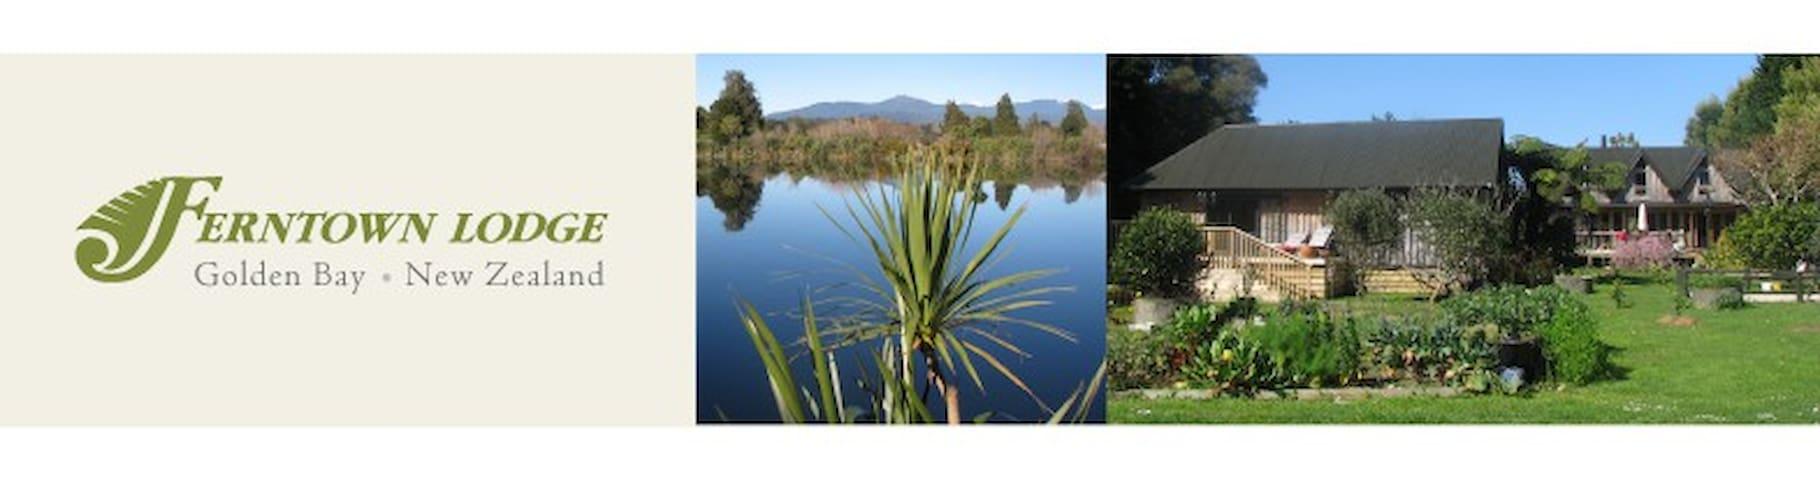 Ferntown Lodge - Collingwood - Natuur/eco-lodge